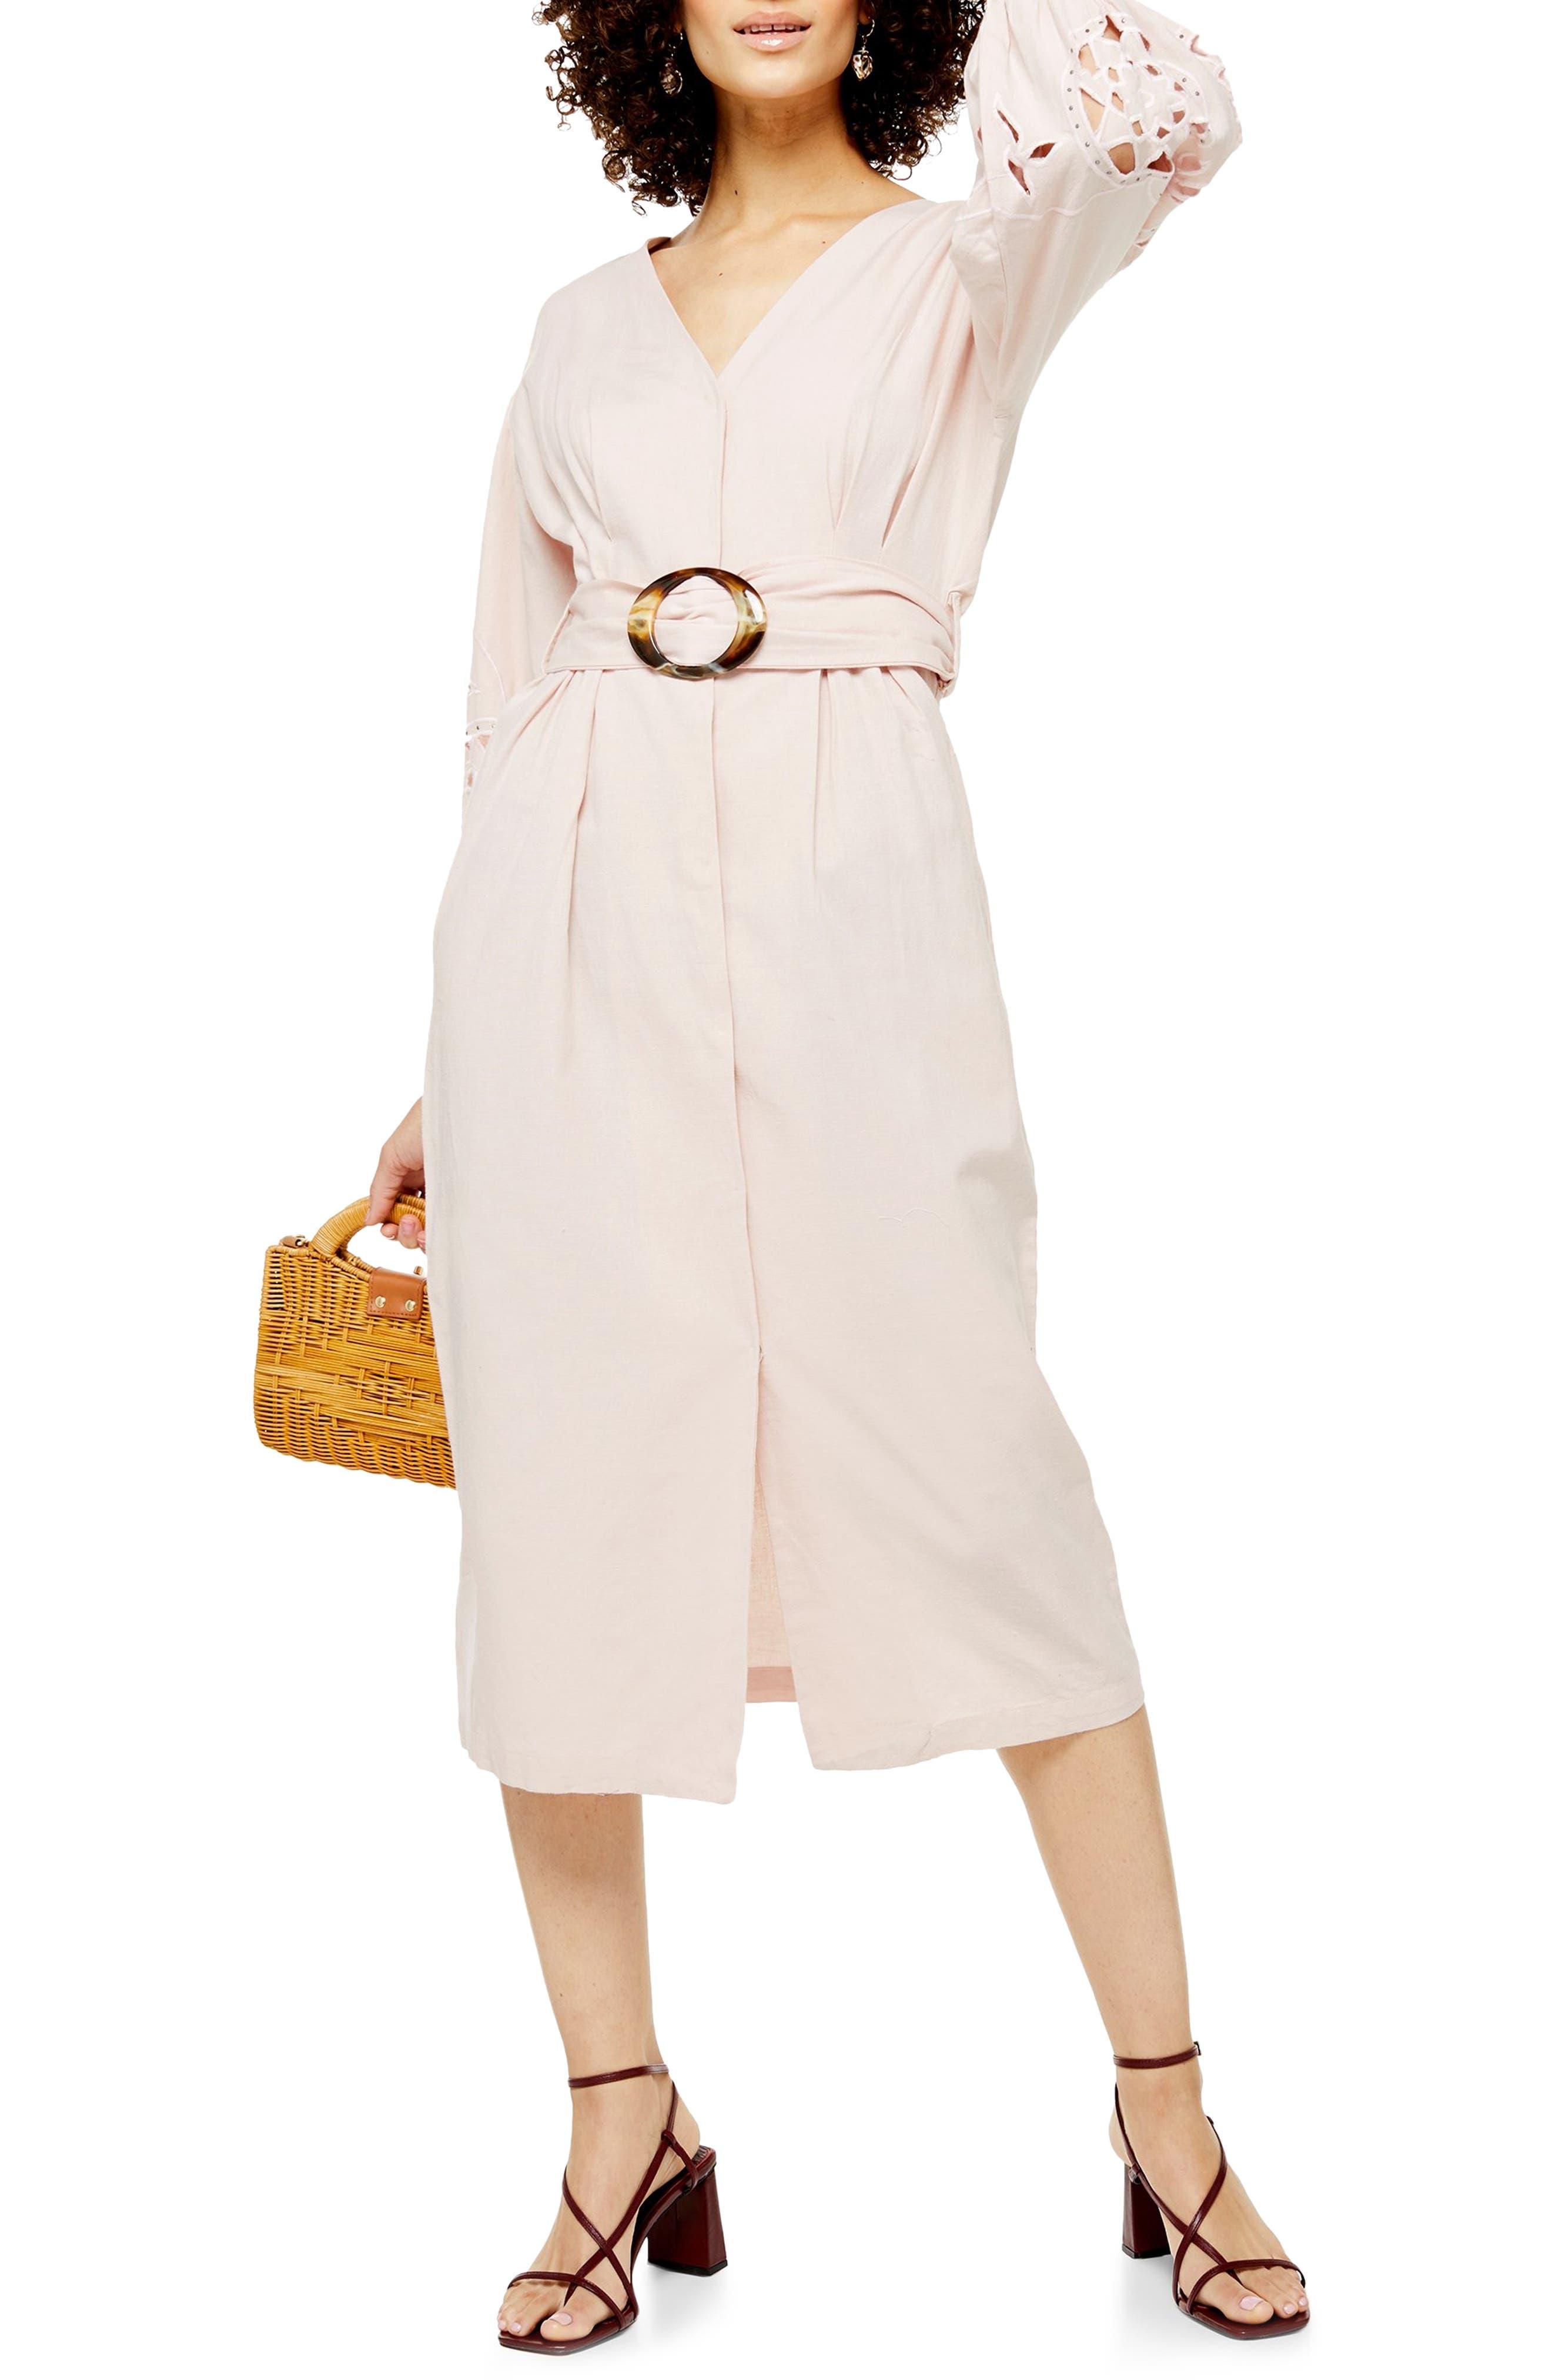 Topshop Cutwork Long Sleeve Midi Dress, US (fits like 6-8) - Pink